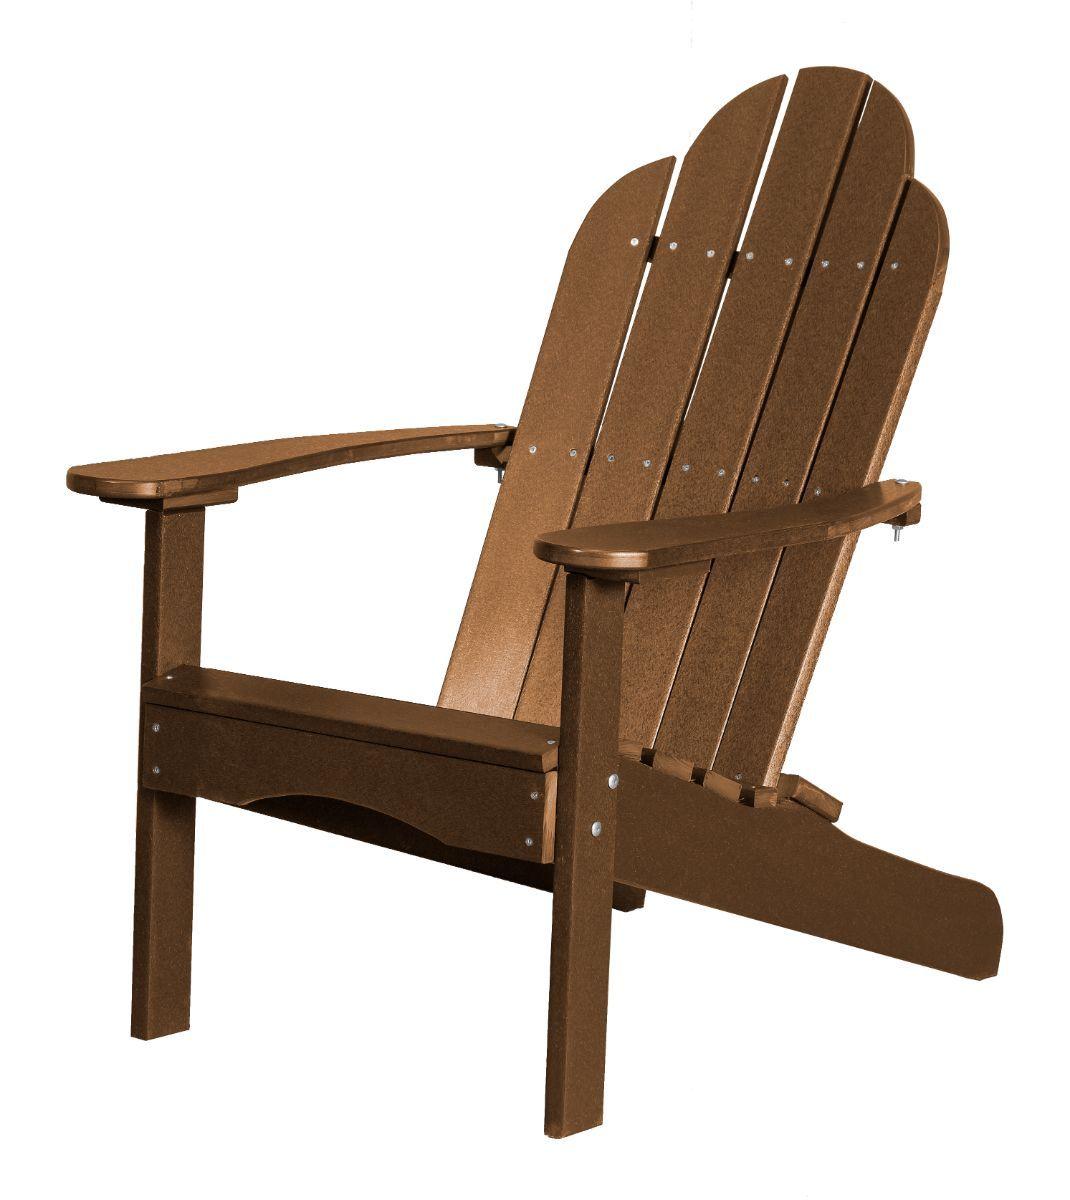 Tudor Brown Odessa Adirondack Chair